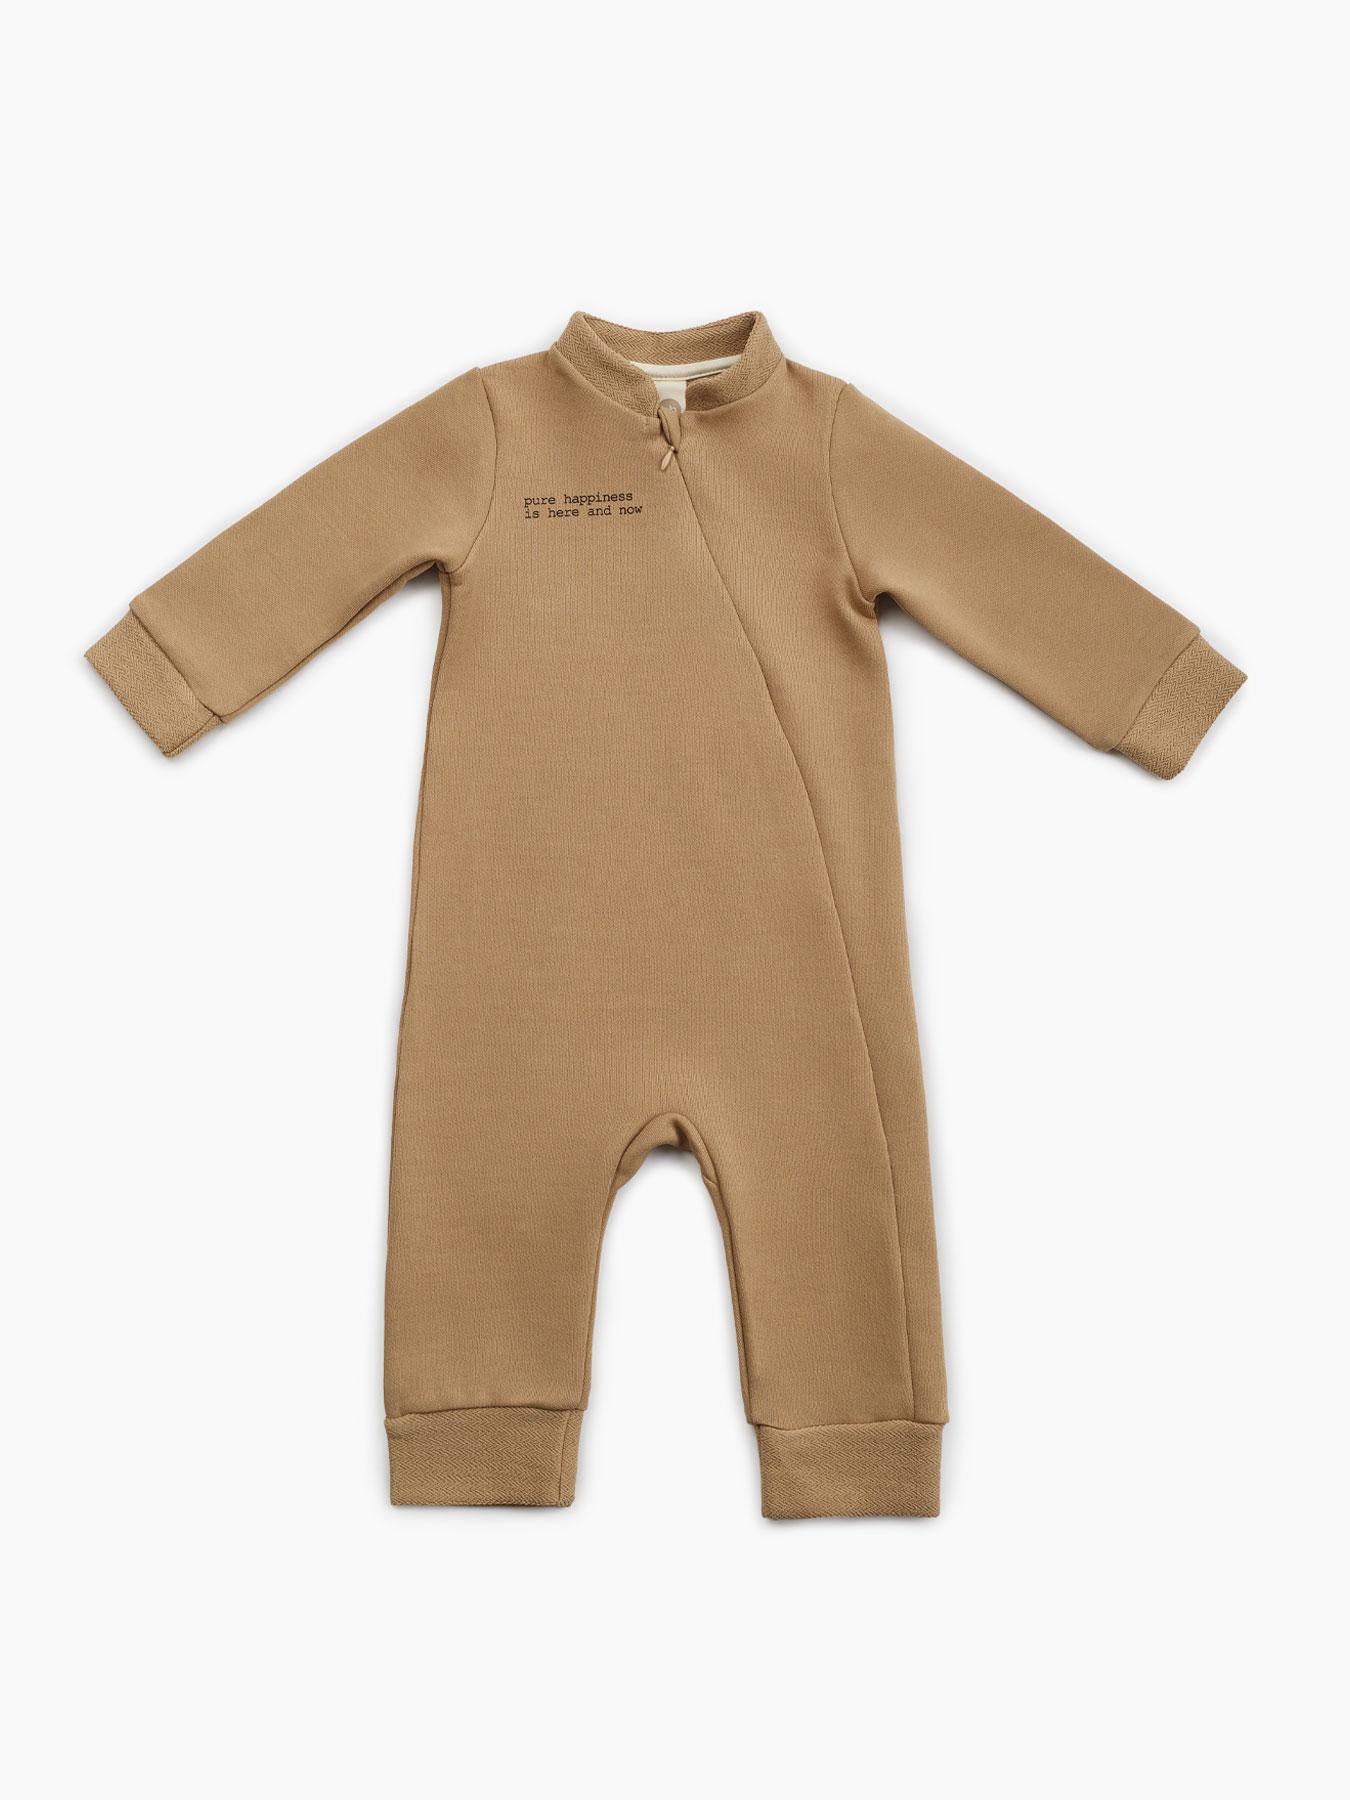 88093, Комбинезон из футера (sand, 86) Happy Baby желтый 86,  - купить со скидкой